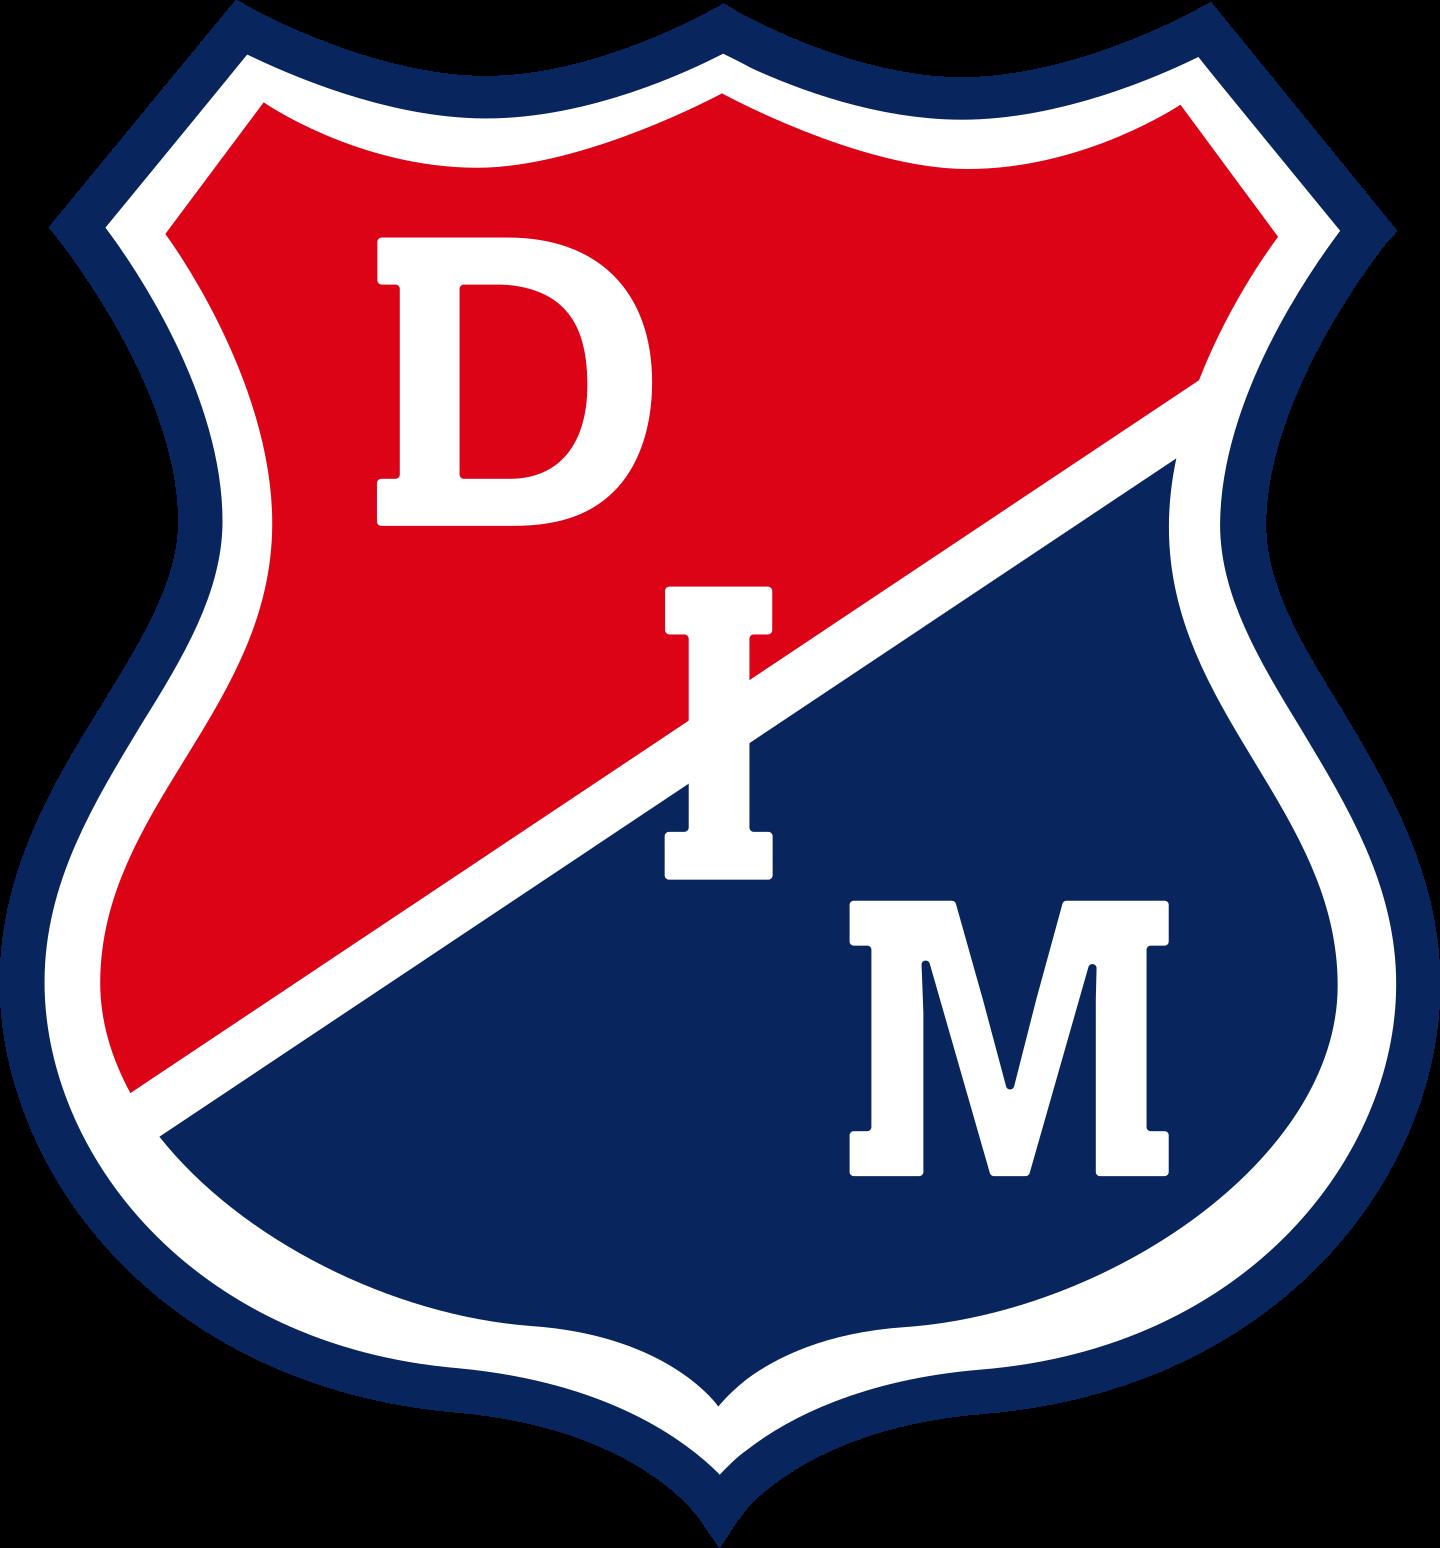 independiente medellin logo 2 - Independiente Medellín Logo